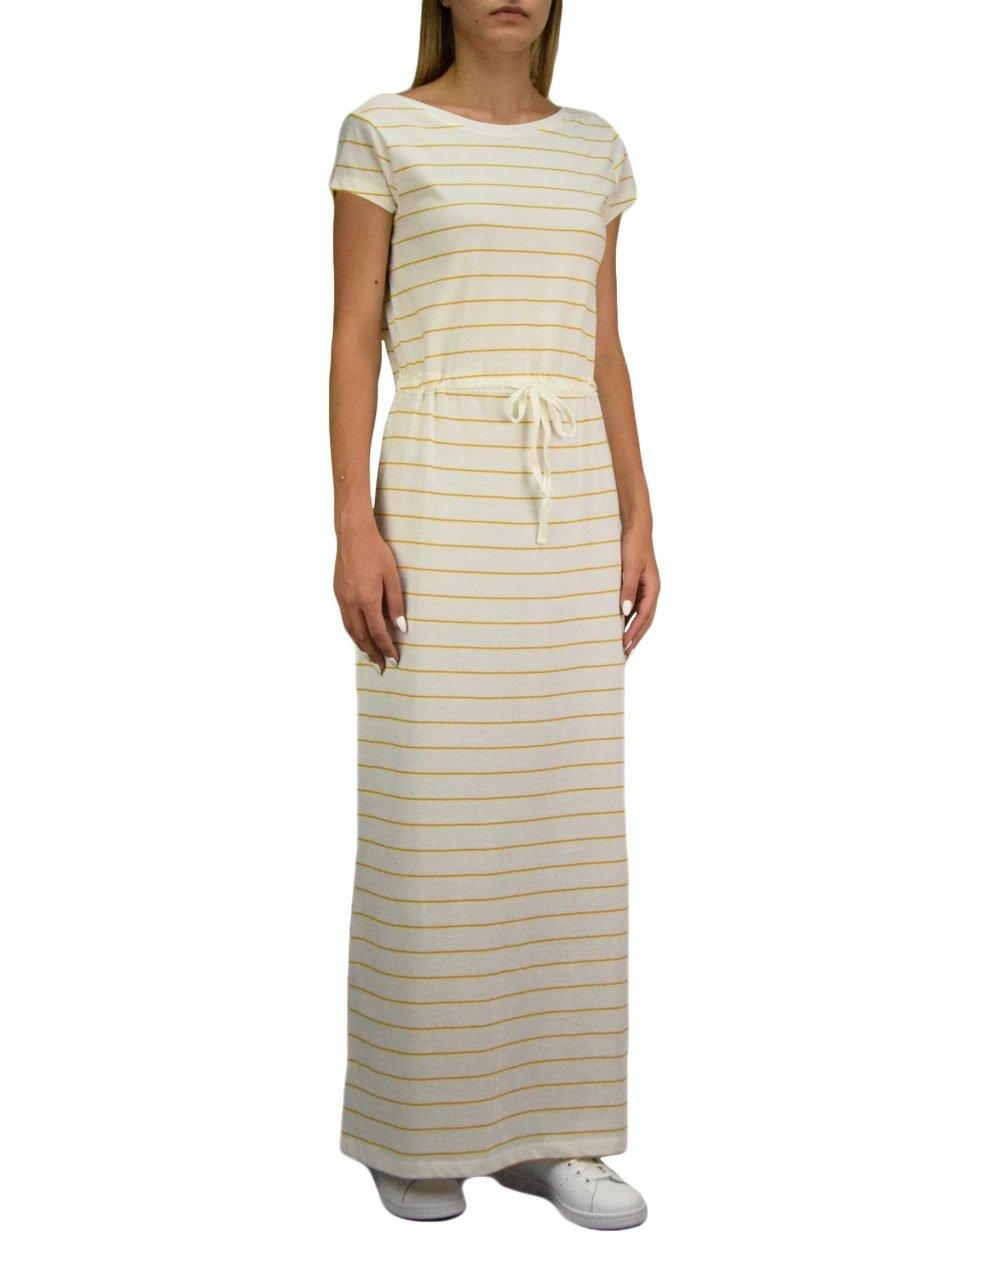 Only May Life String Maxi Dress (15202995) Cloud Dancer/Golden